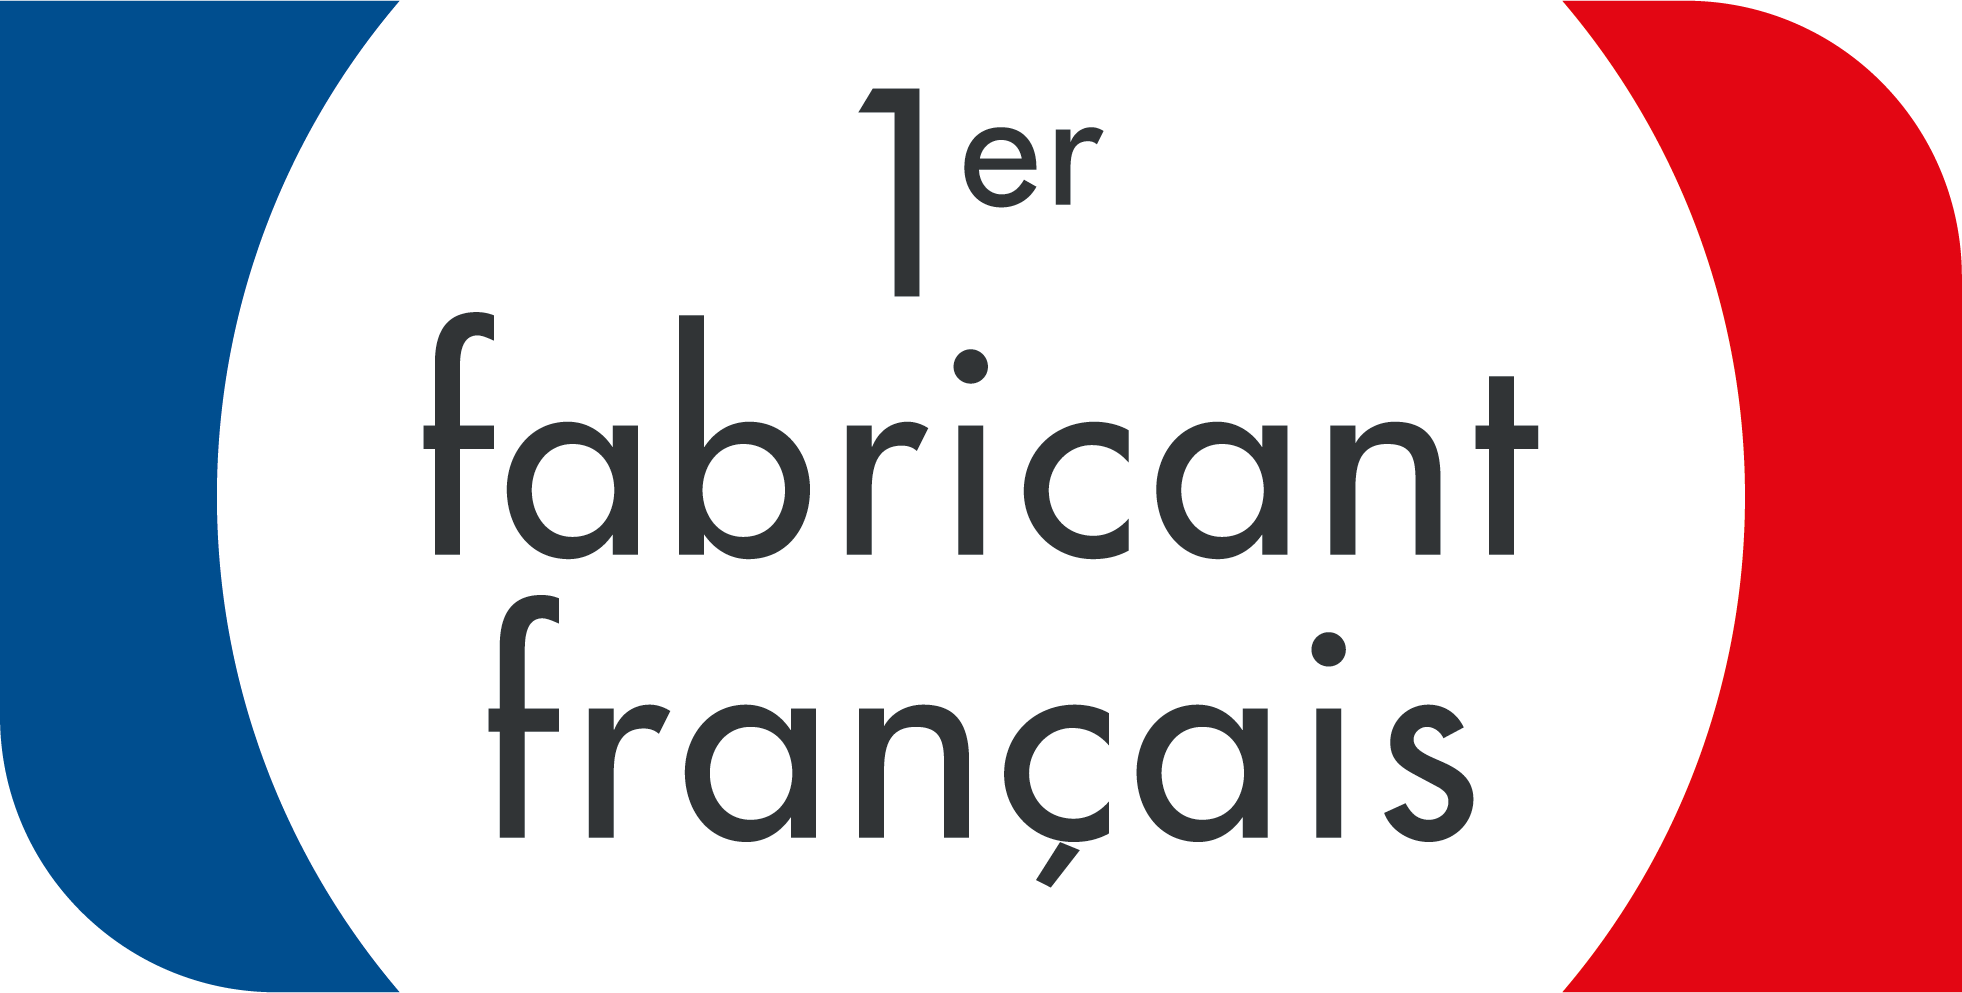 Logo du 1er fabriquant